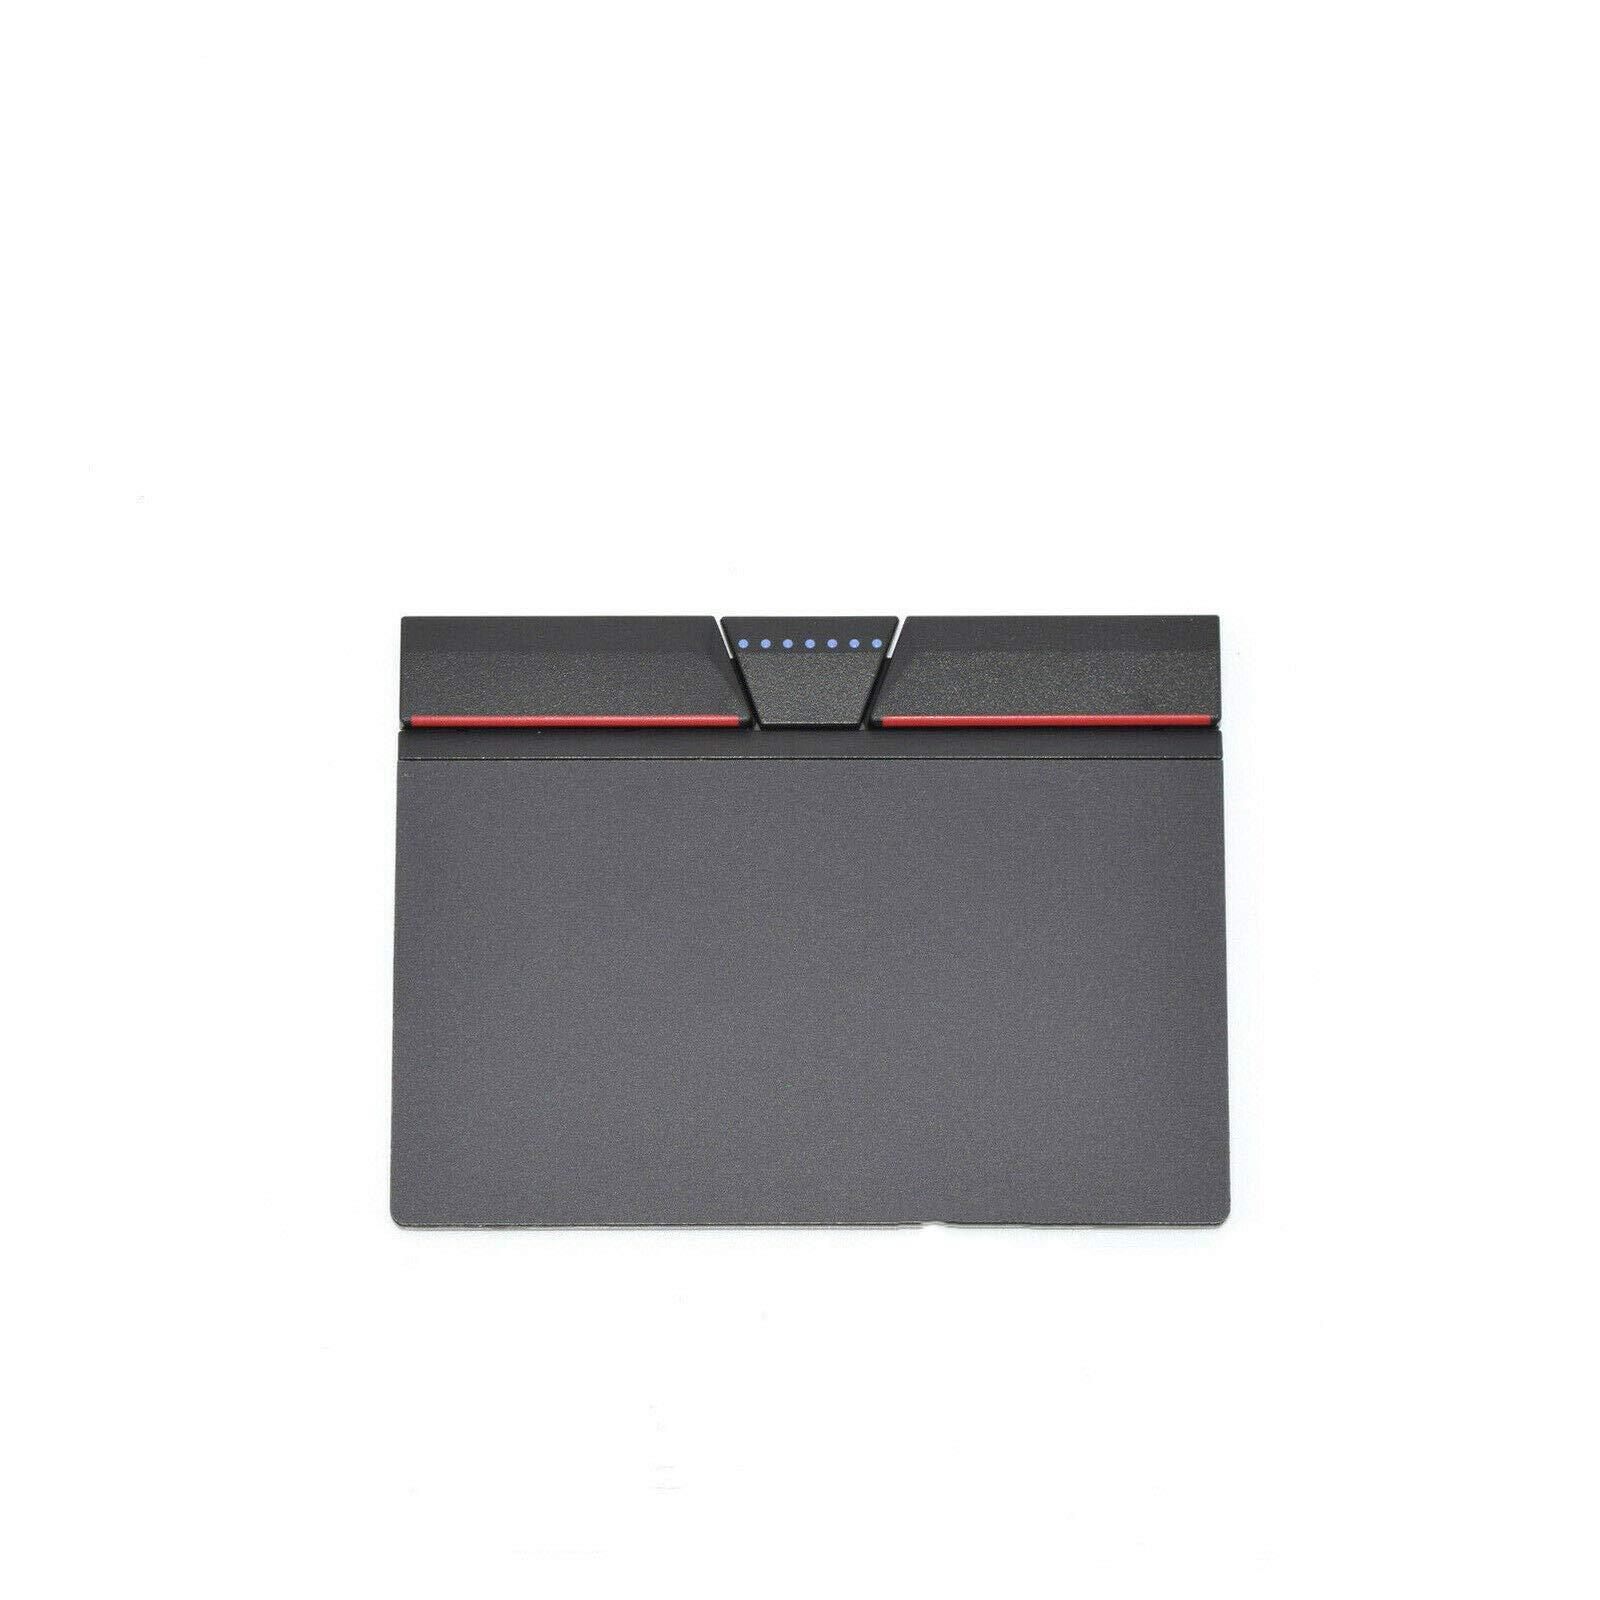 New Replacement for Lenovo Thinkpad T550 T560 E470 E570 E550 E560 Touchpad Clickpad Trackpad by viky